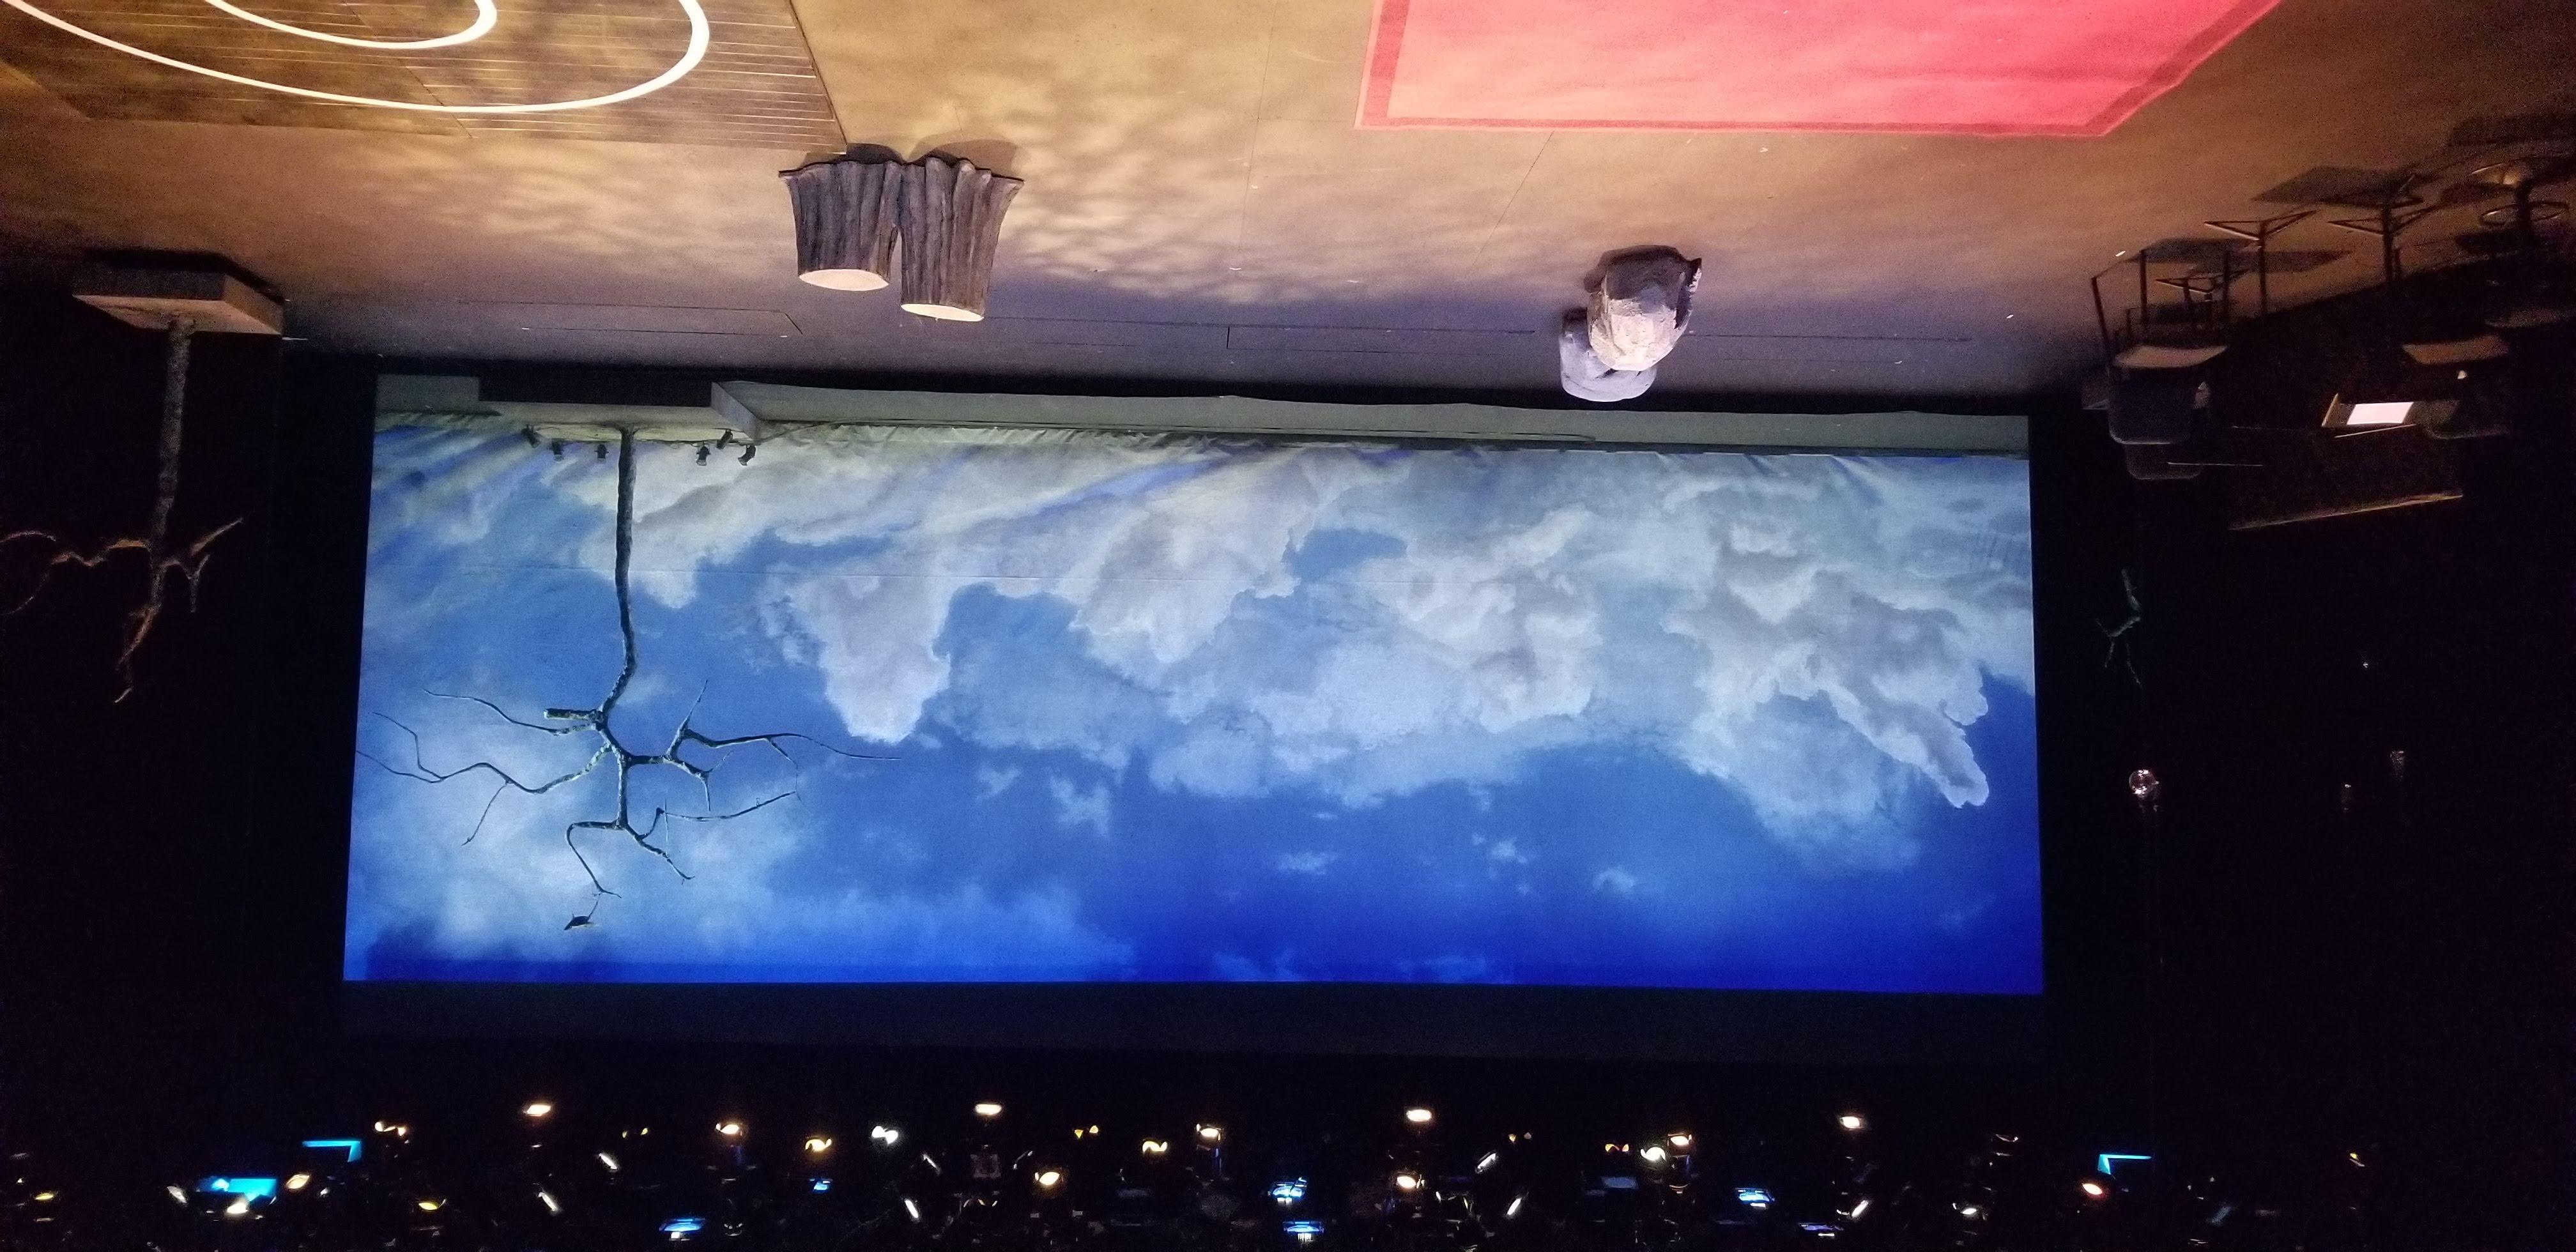 Sky Drop - As You Like It 15'x50'